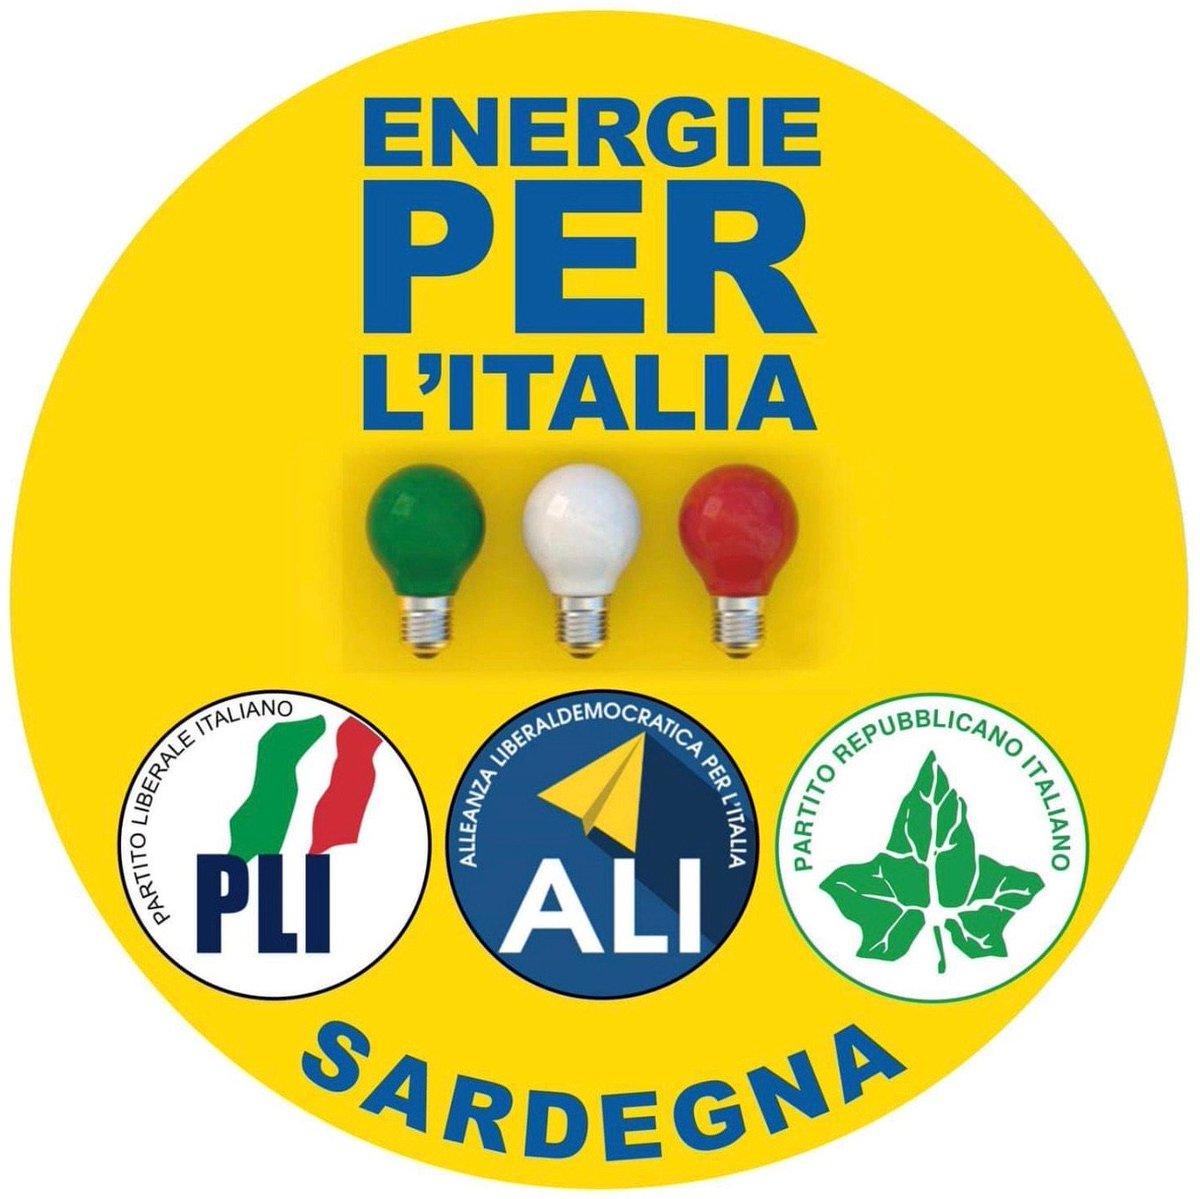 Energie Per Litalia Sardegna At Energieperlita2 Twitter